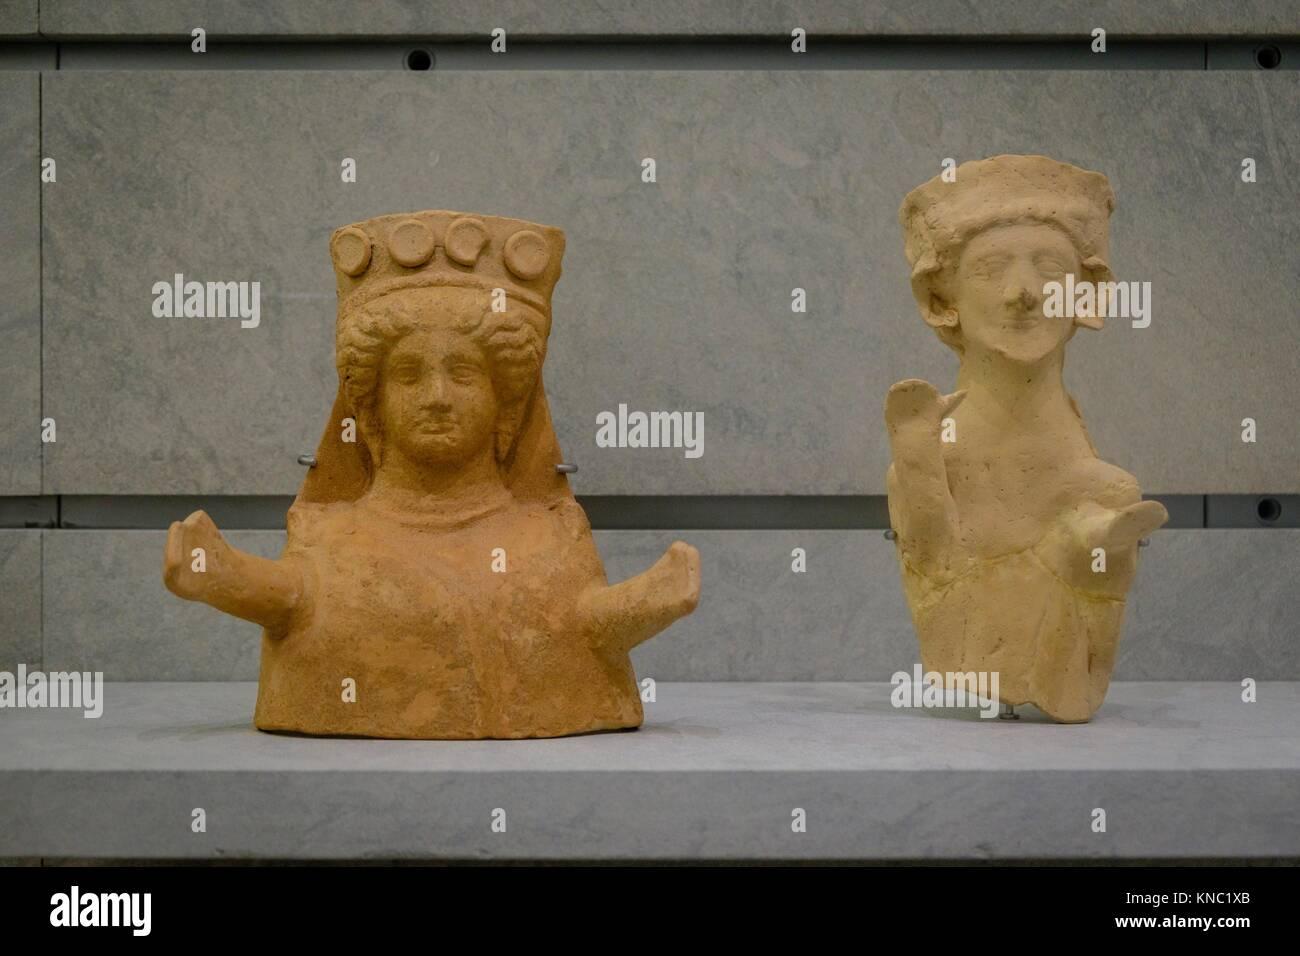 Male figure and female bust, 450-425 b.C., Ibiza and Formentera Archeological Museum, Patrimonio de la Humanidad - Stock Image